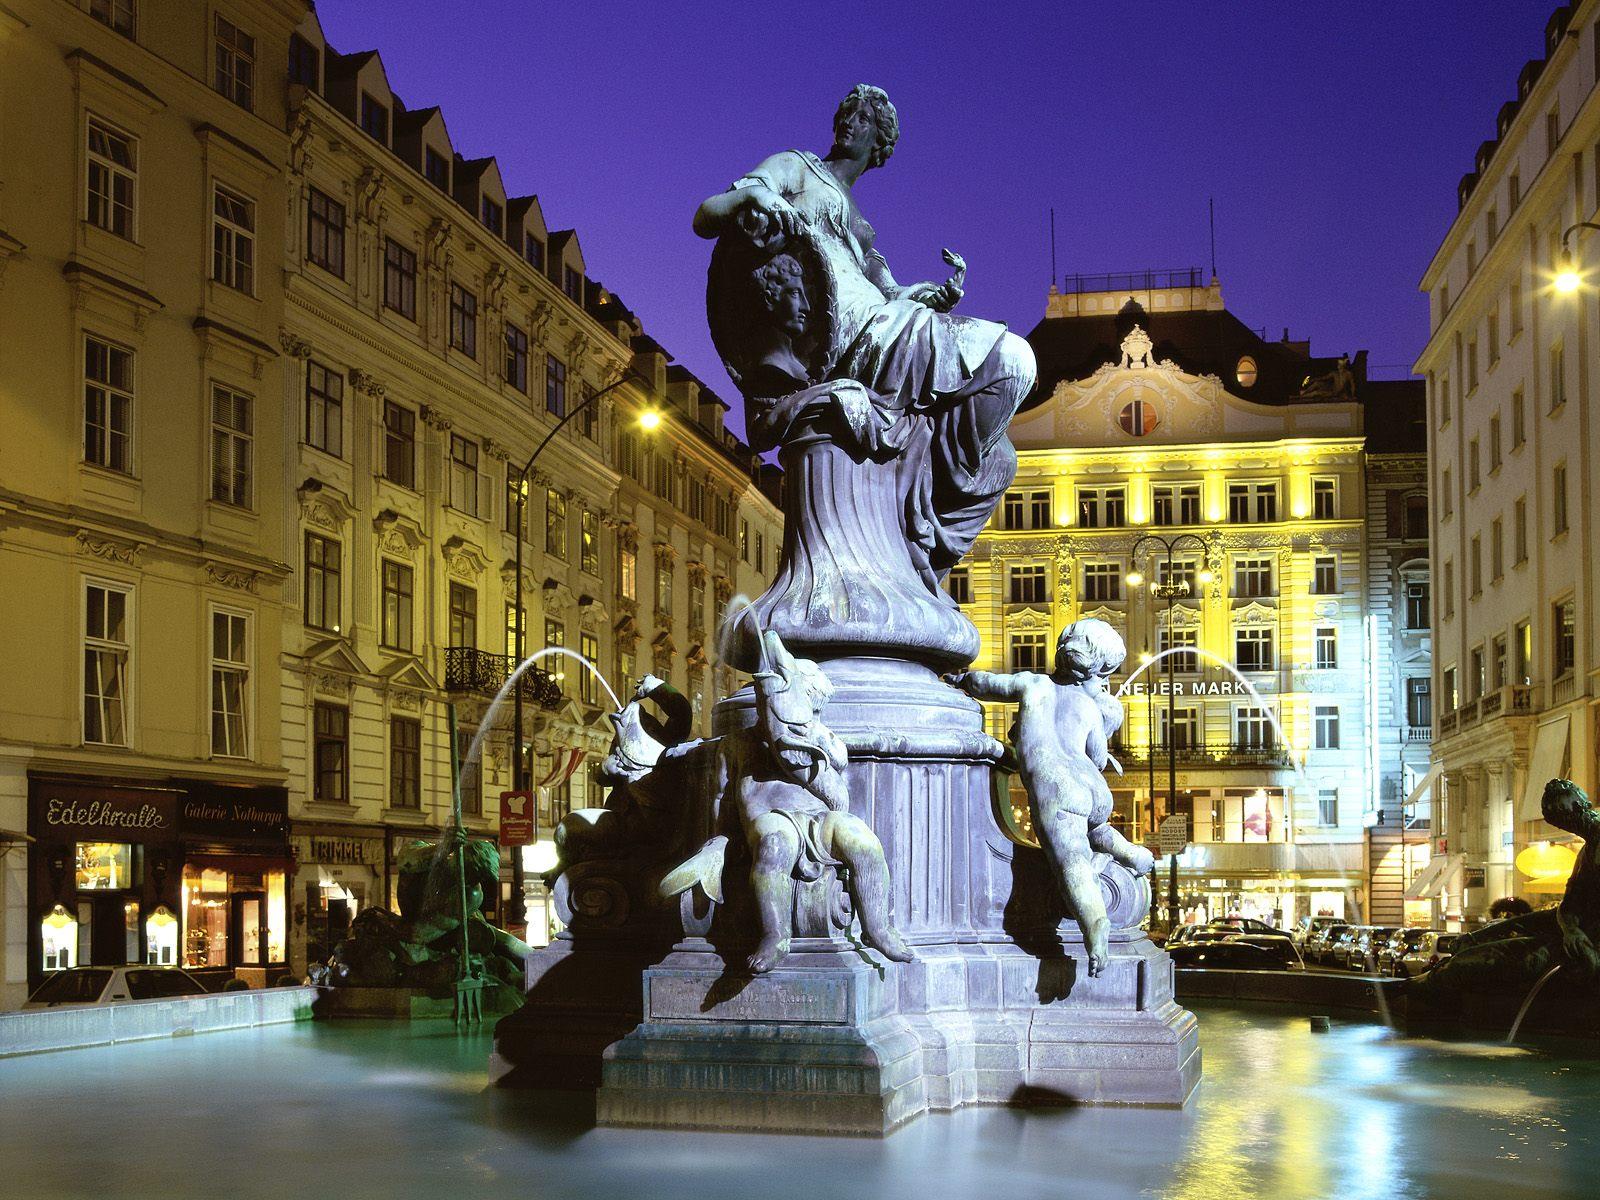 http://4.bp.blogspot.com/-LvdC7wgQQ68/TonJuco_RCI/AAAAAAAAAYk/nu34pa0TK30/s1600/Donnerbrunnen+Fountain%252C+Vienna%252C+Austria.jpg